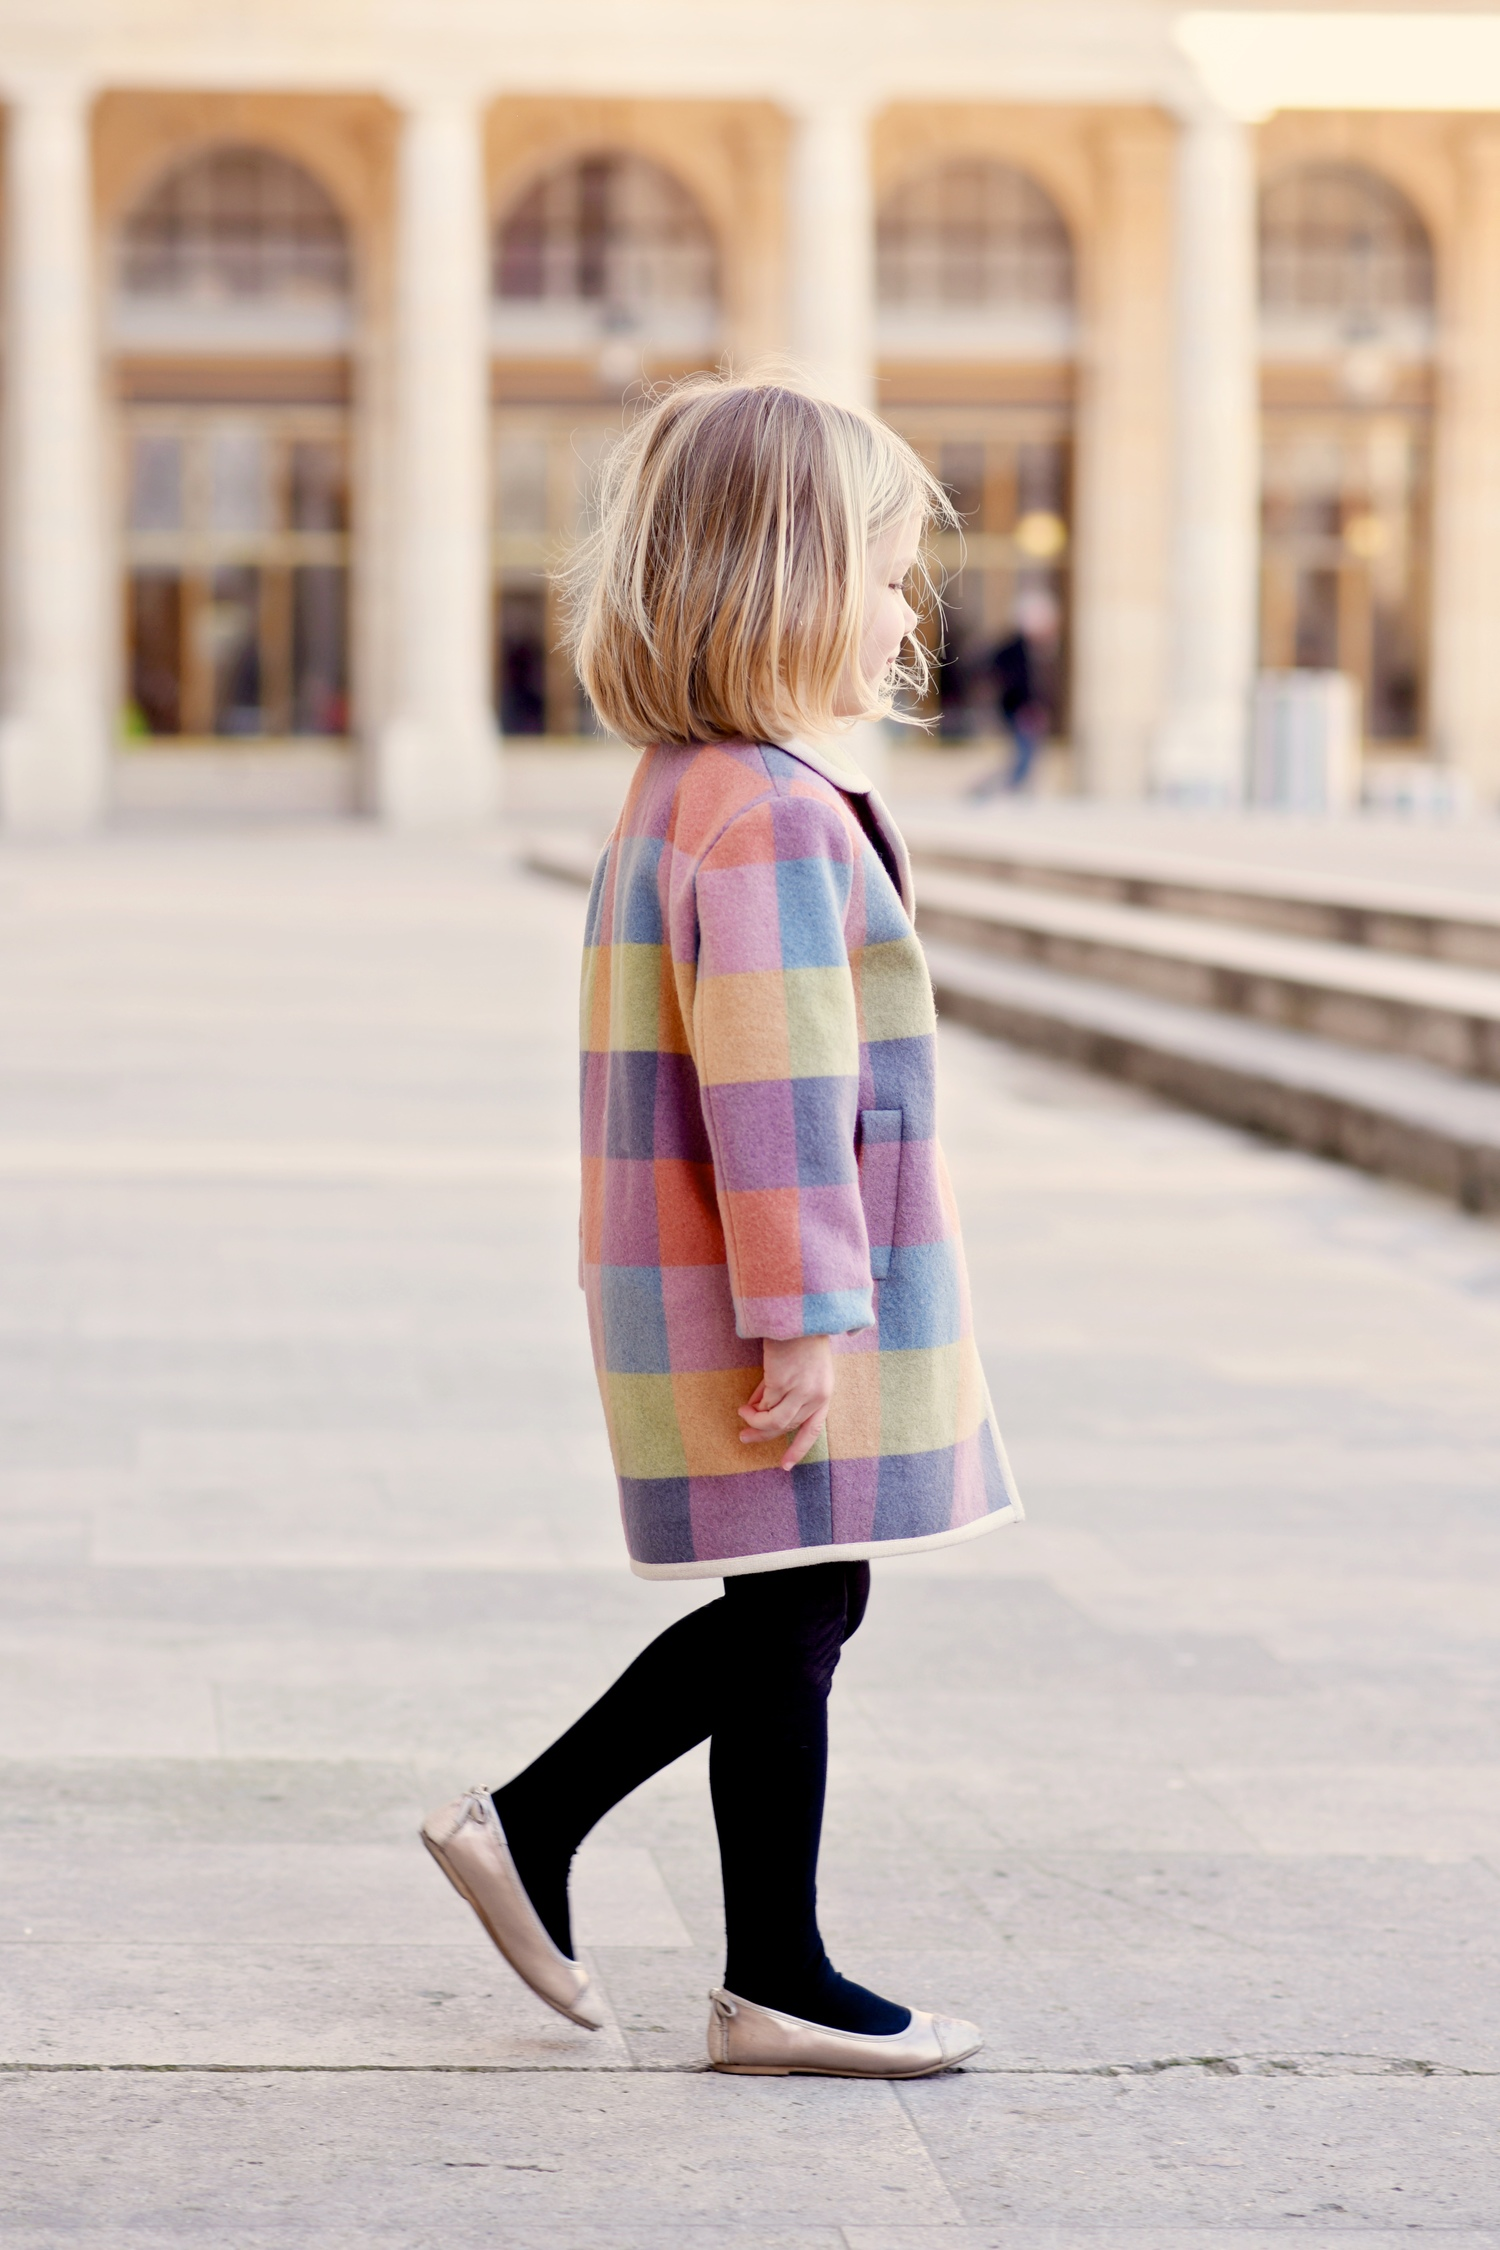 Enfant+Street+Style+by+Gina+Kim+Photography+mini+preen+coat.jpeg